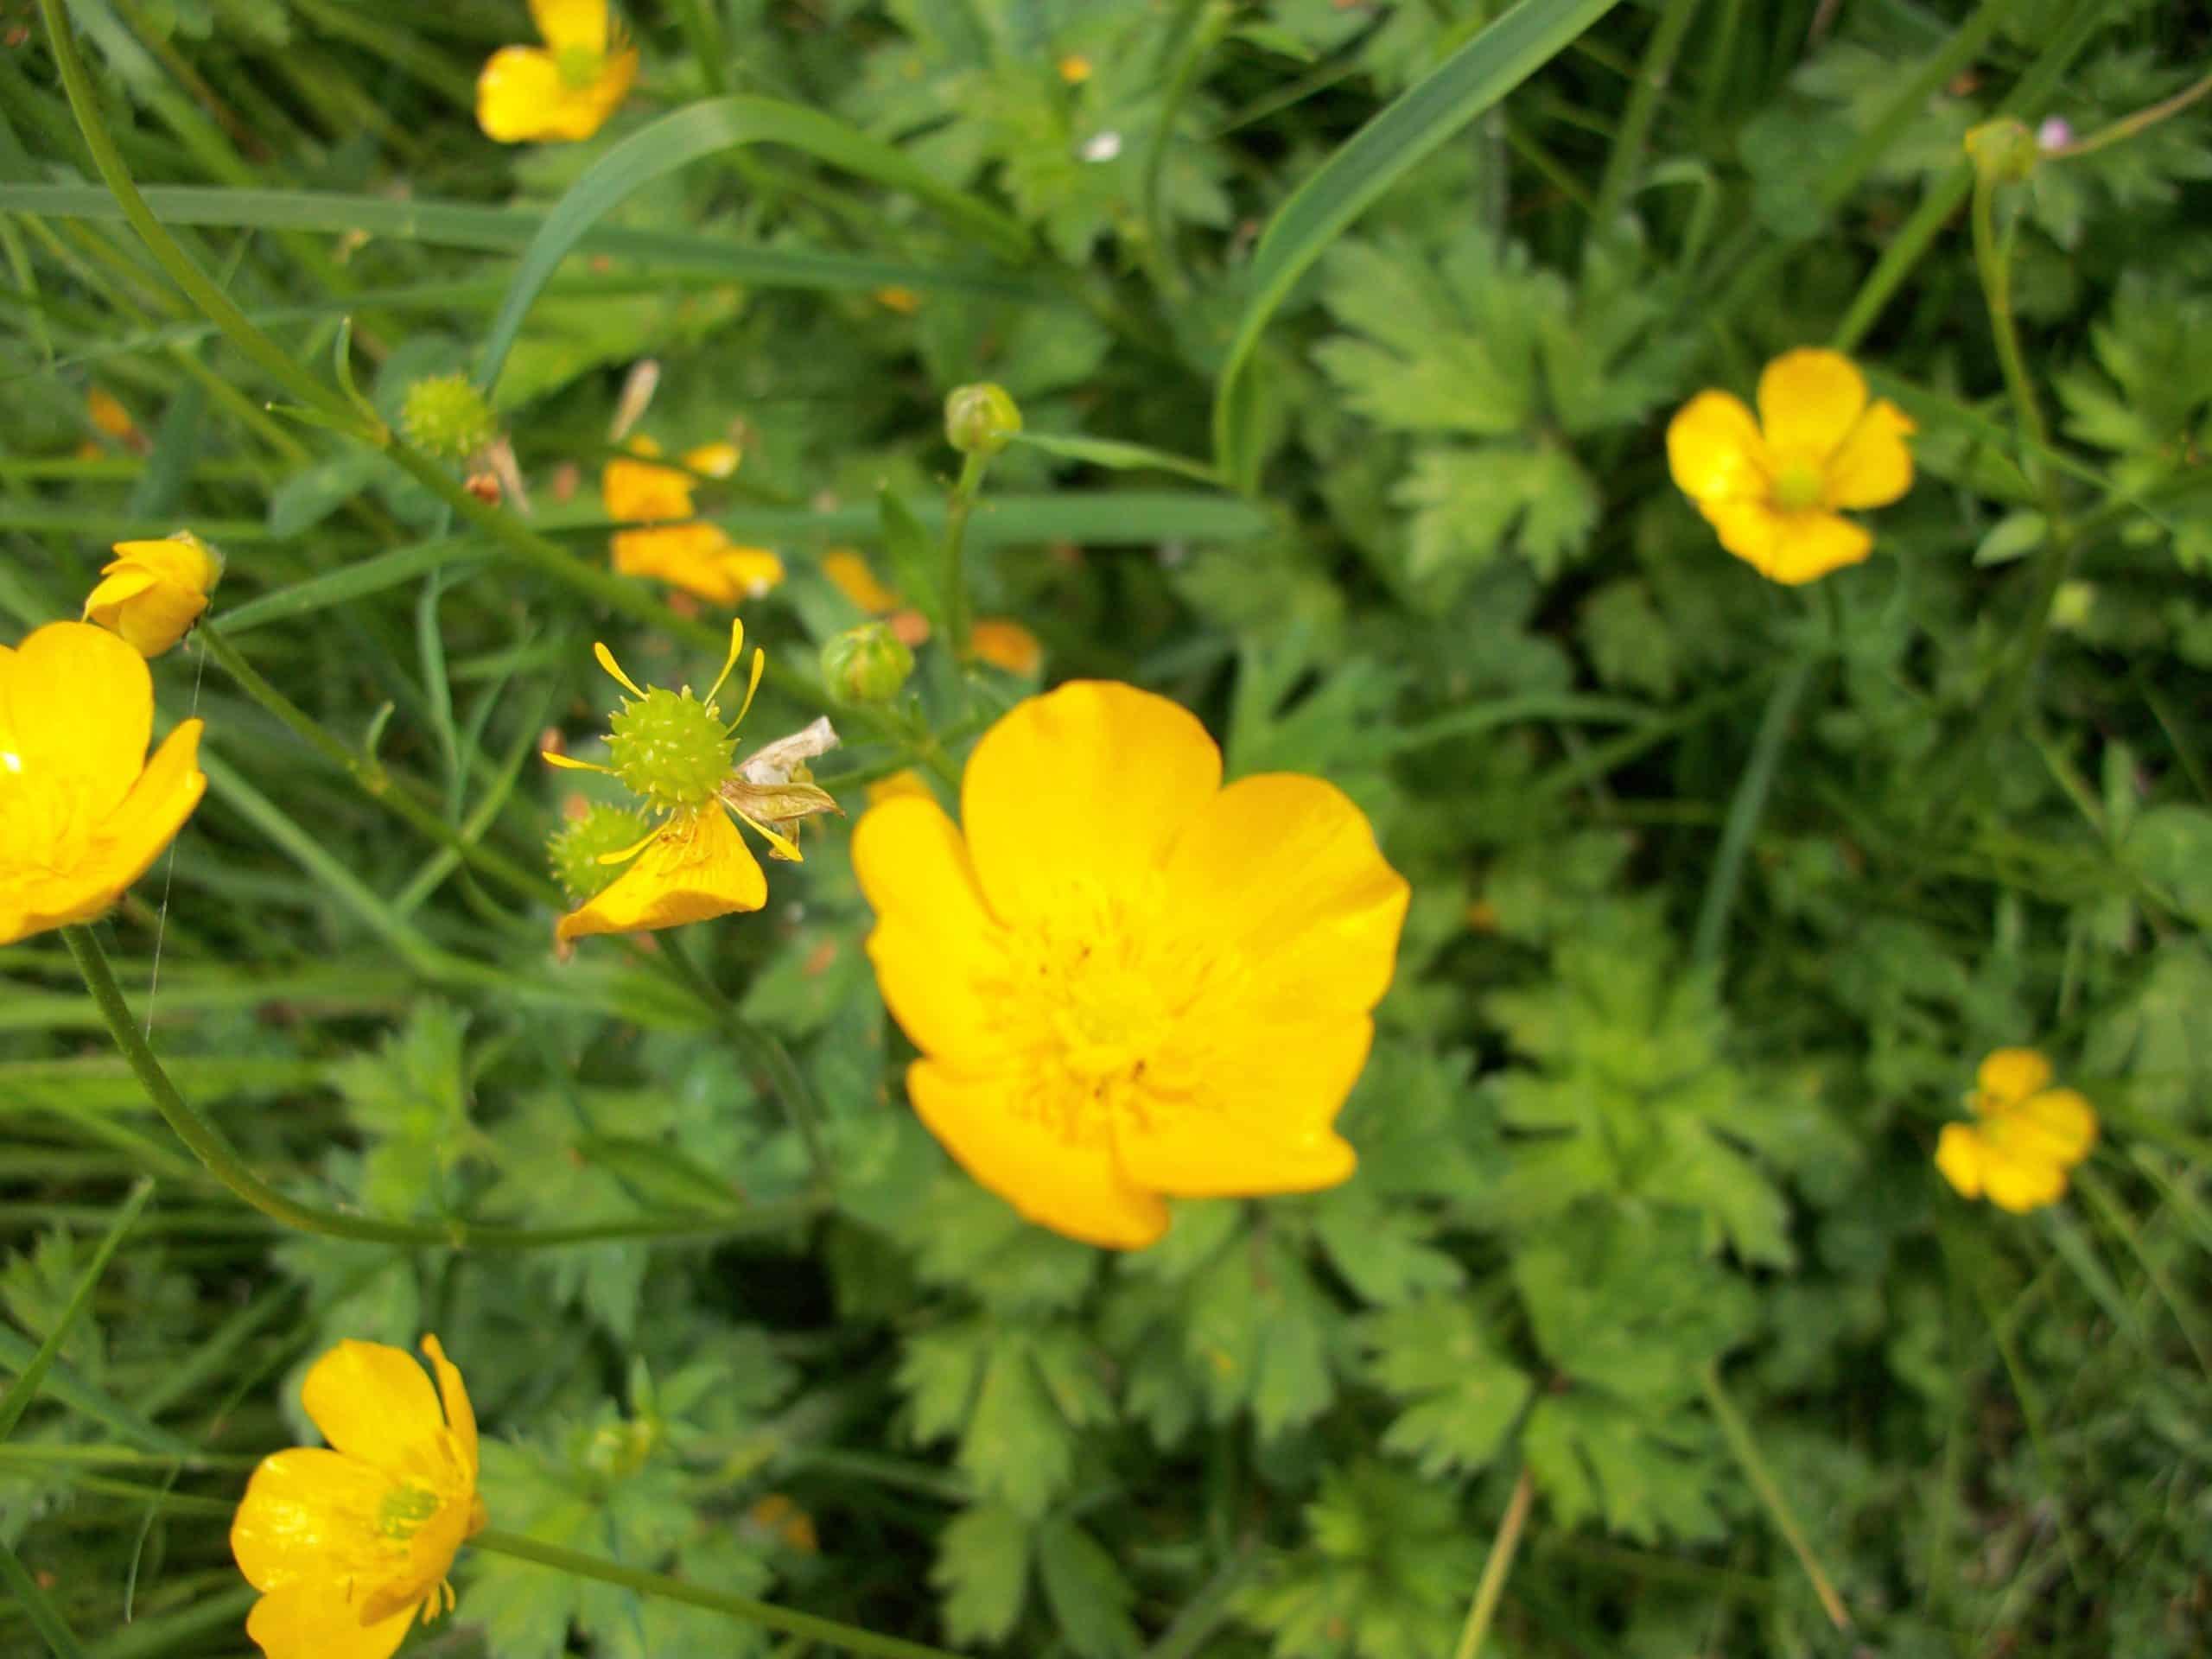 Buttercup. (Ranunculus).